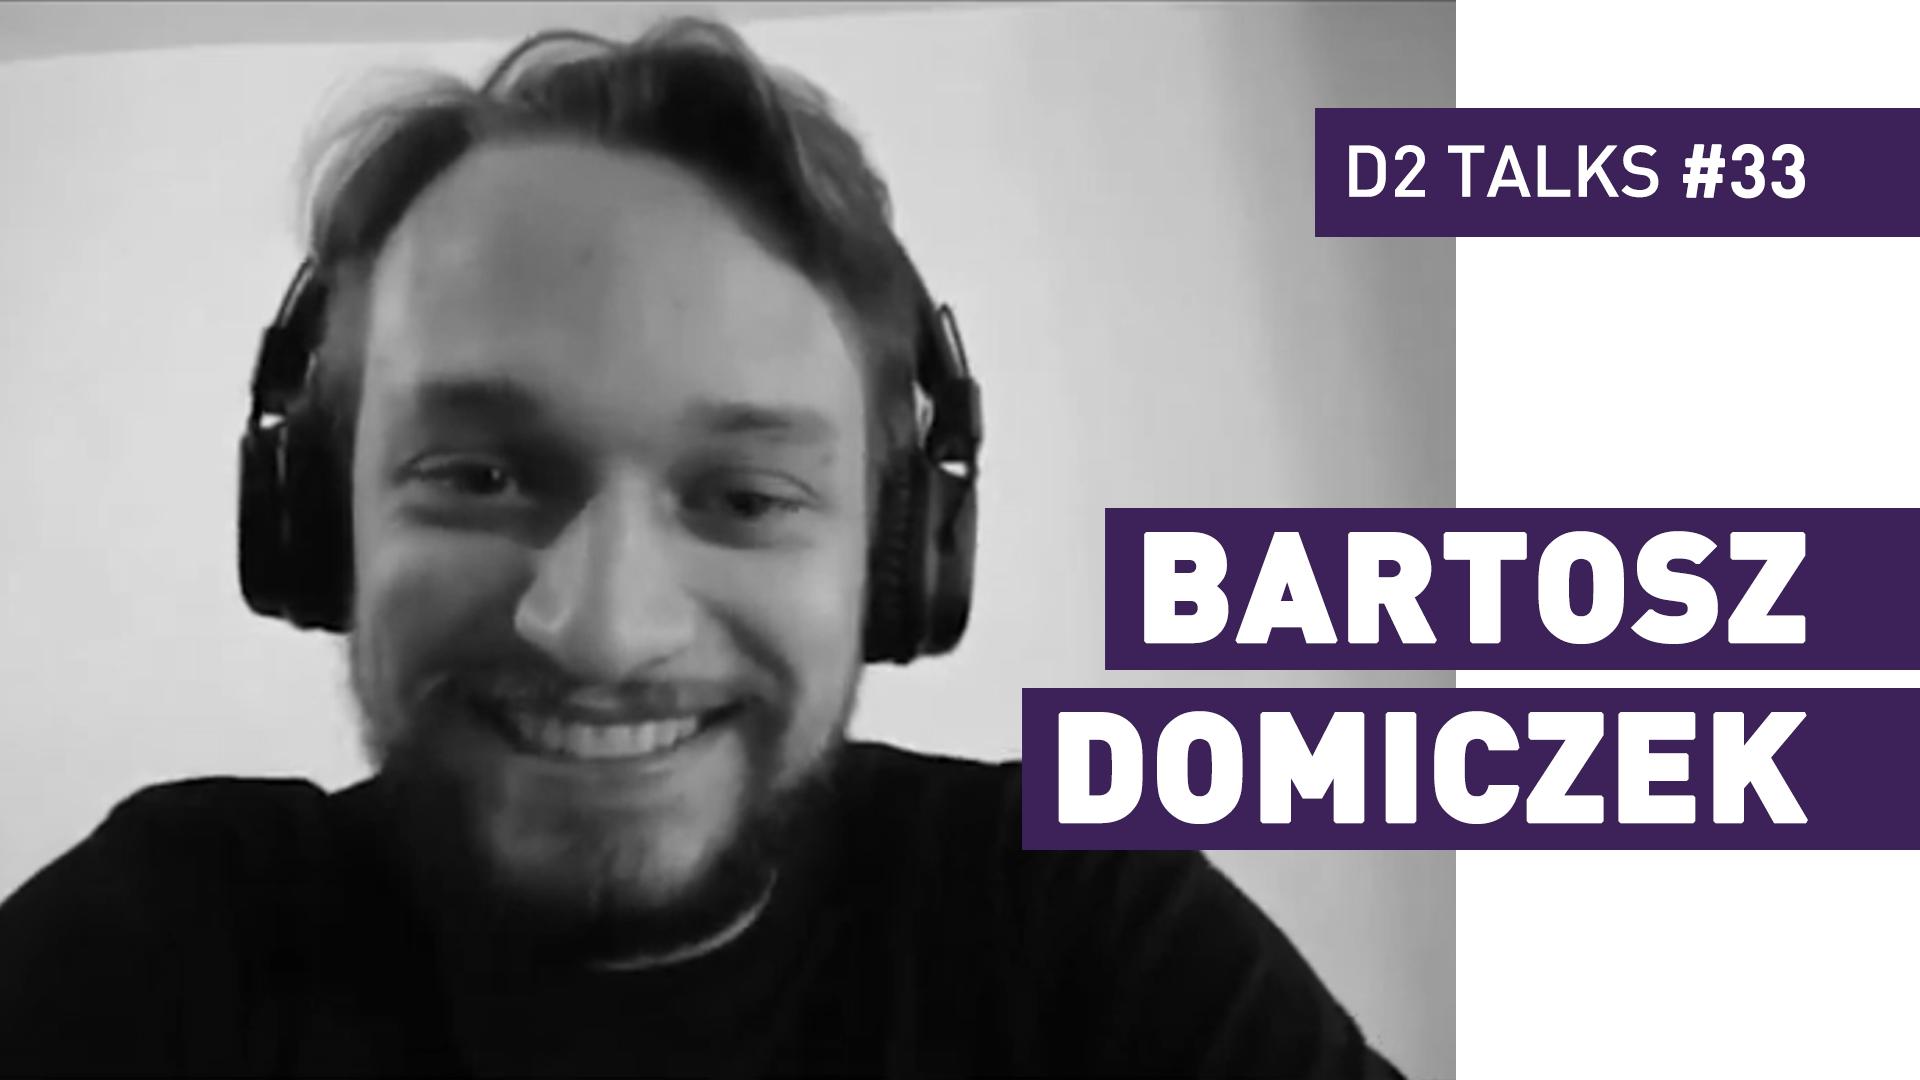 D2 Talks #33: Bartosz Domiczek